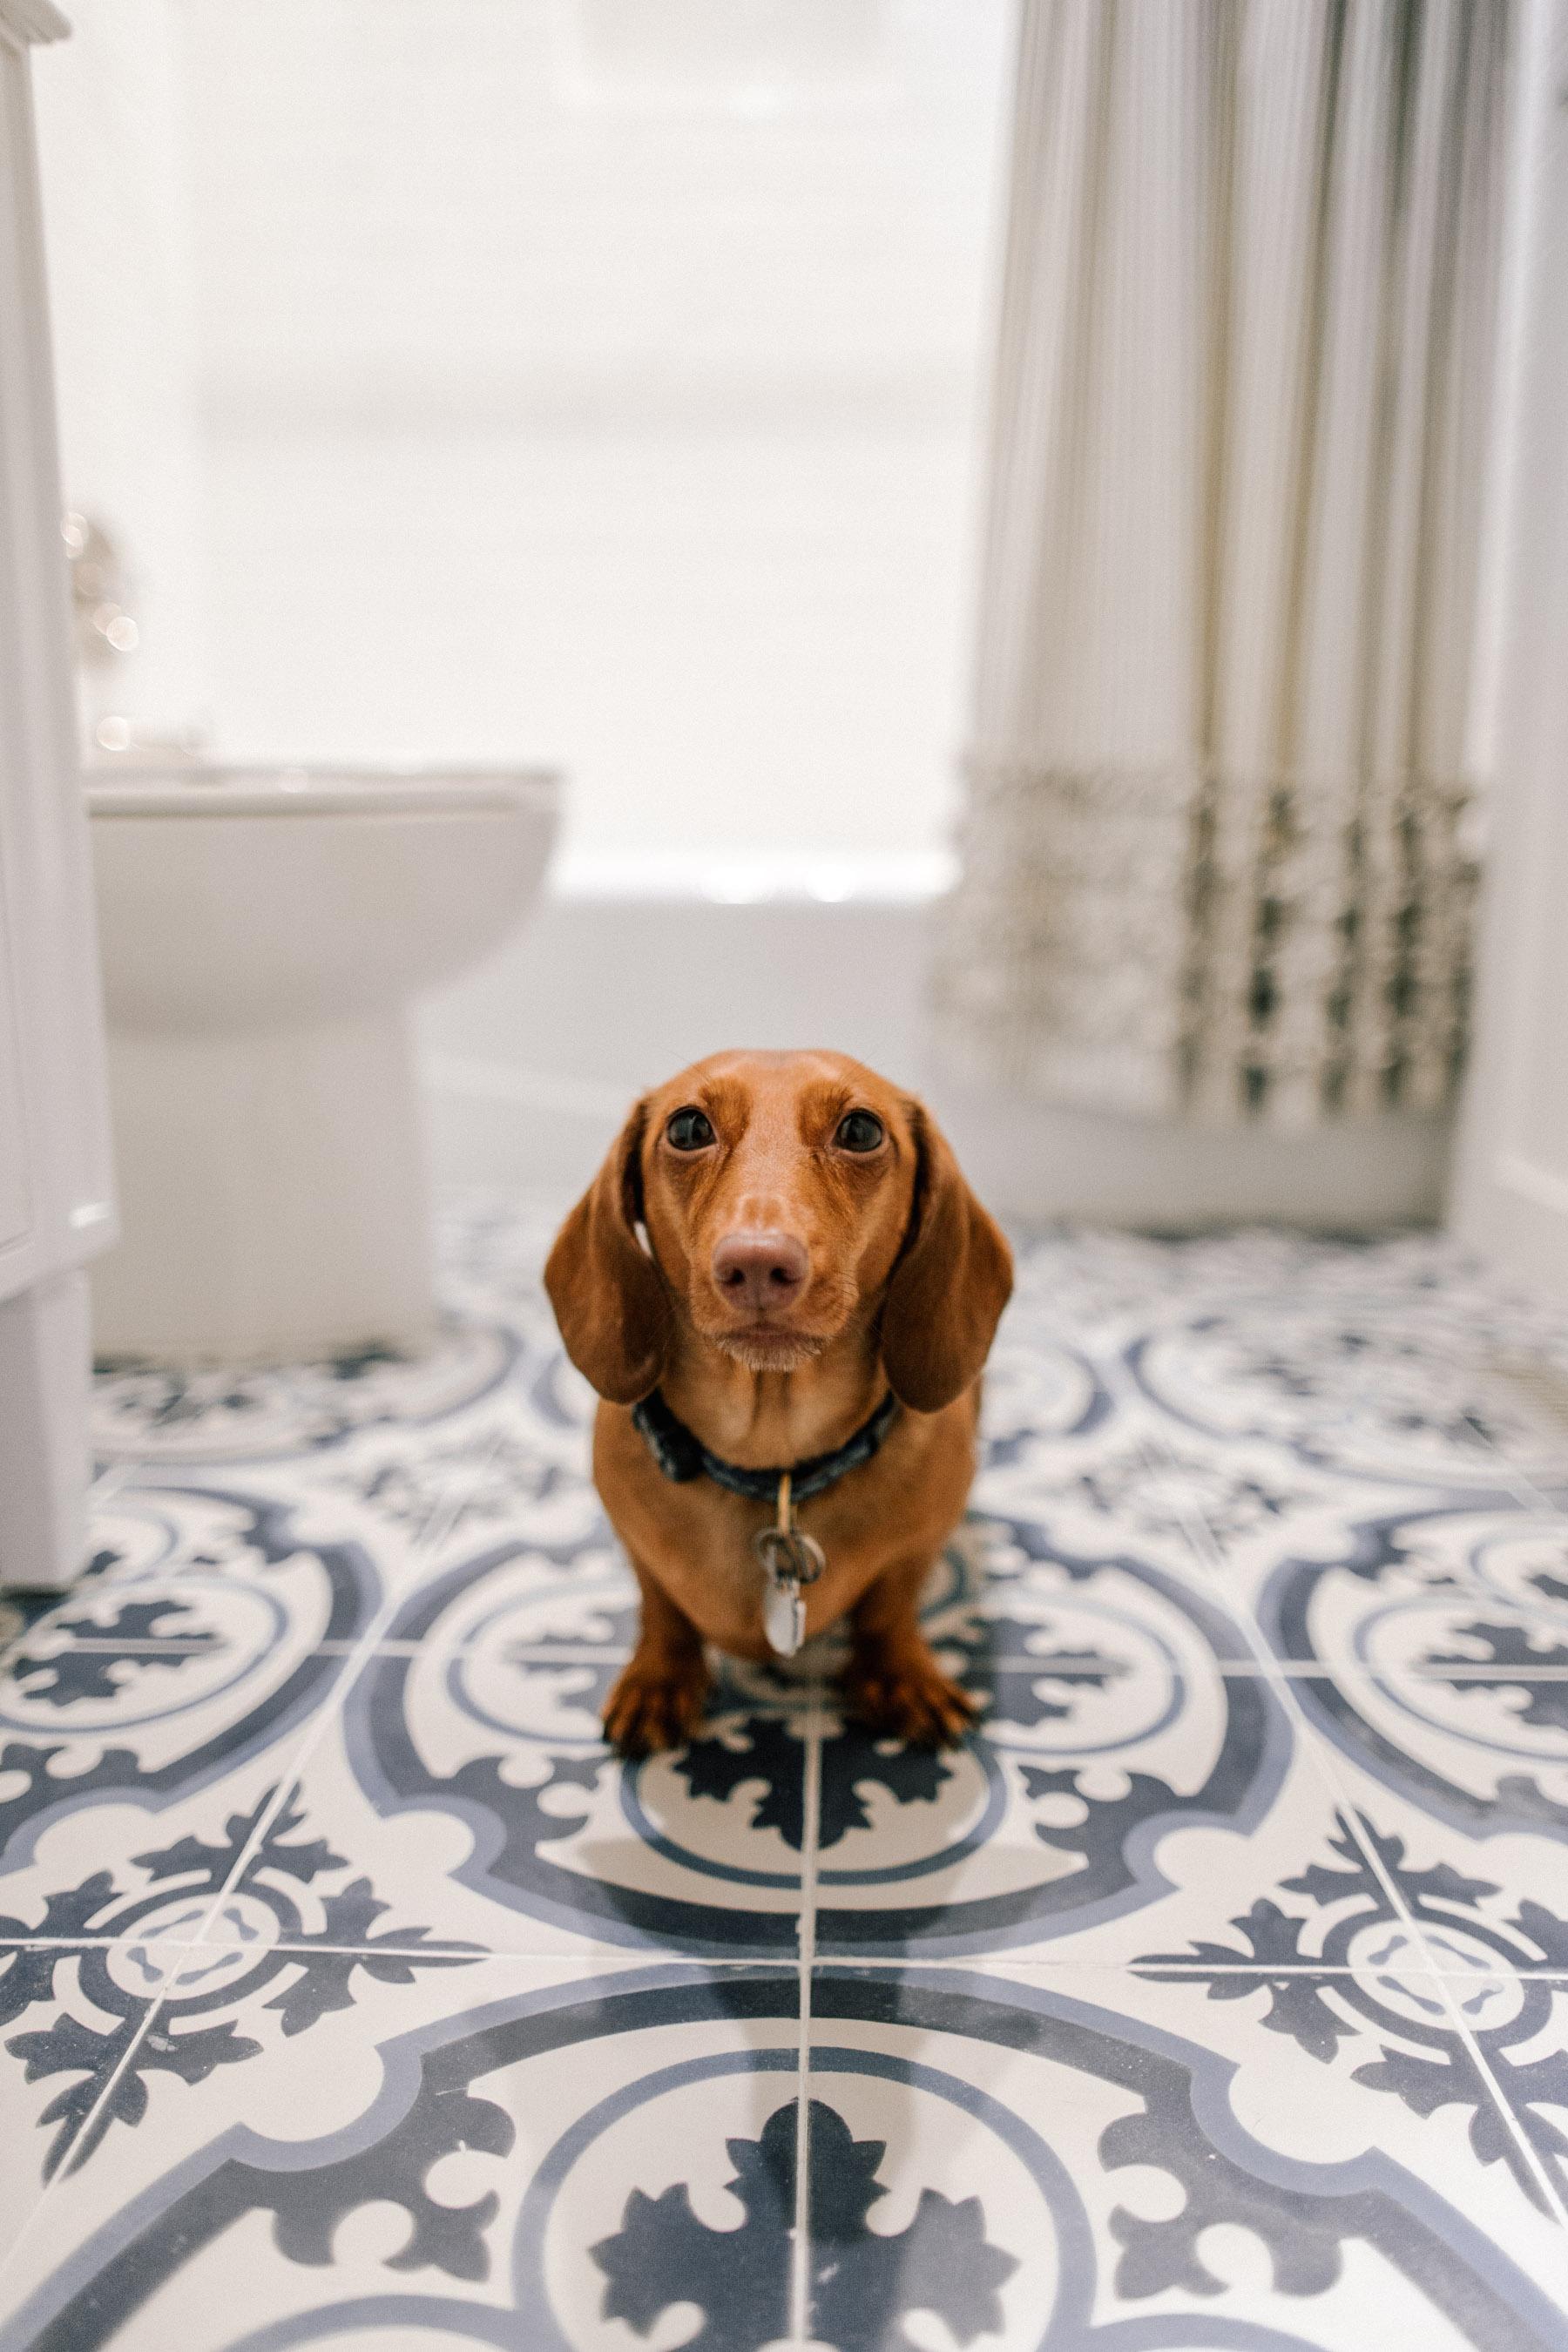 Our Bathroom Renovation